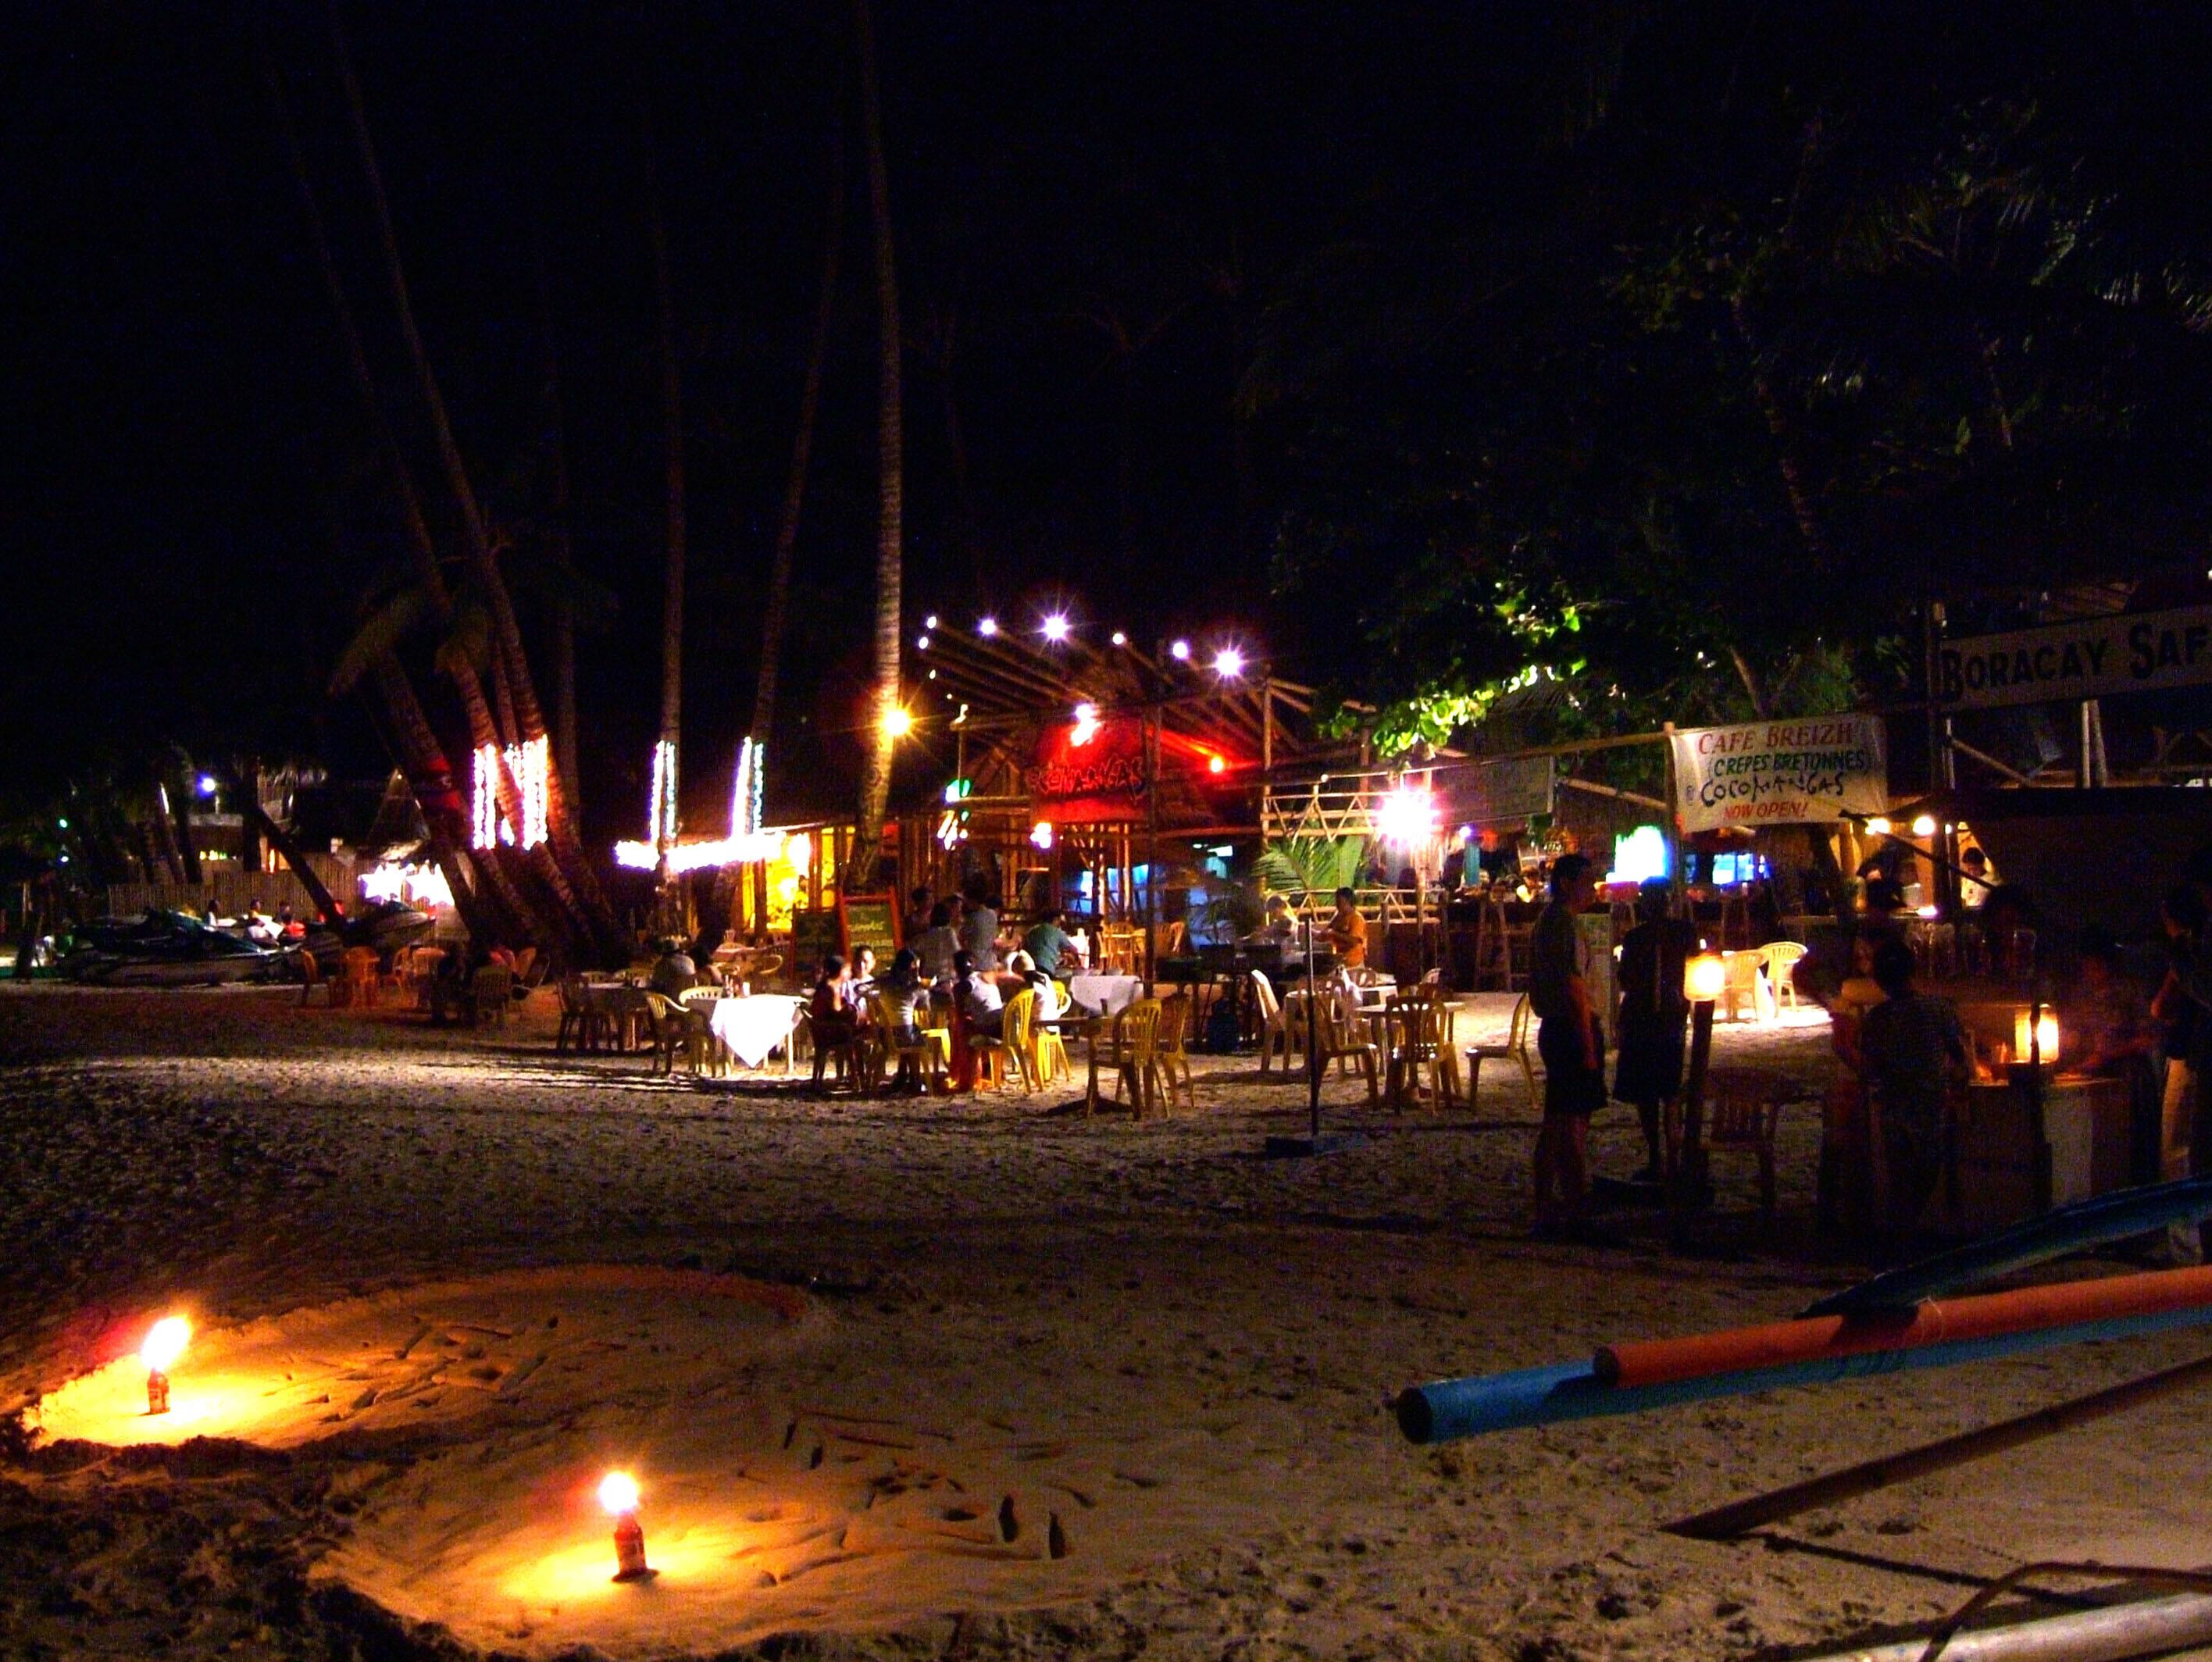 Philippines Sugar Islands Caticlan Boracay White Beach Night Life Dec 2003 05